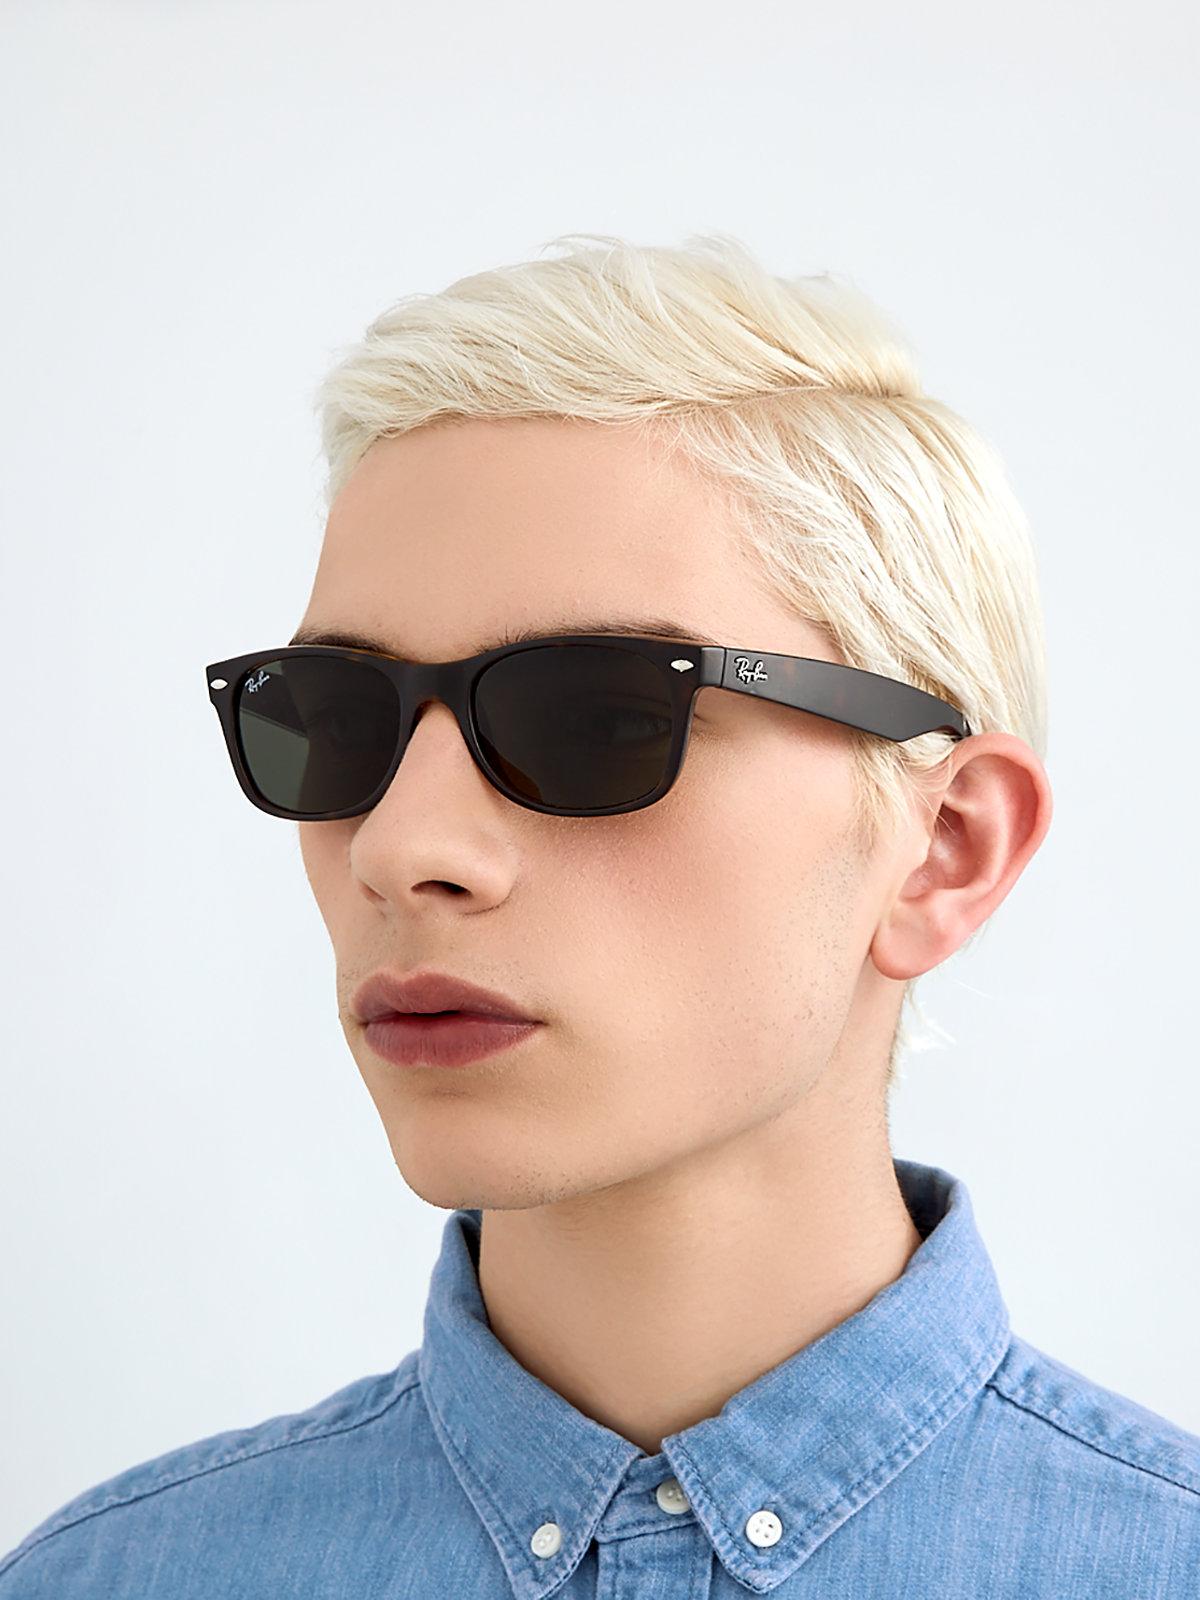 b48d5f4b0 Ray-Ban NEW WAYFARER | Glasses.com® | Free Shipping